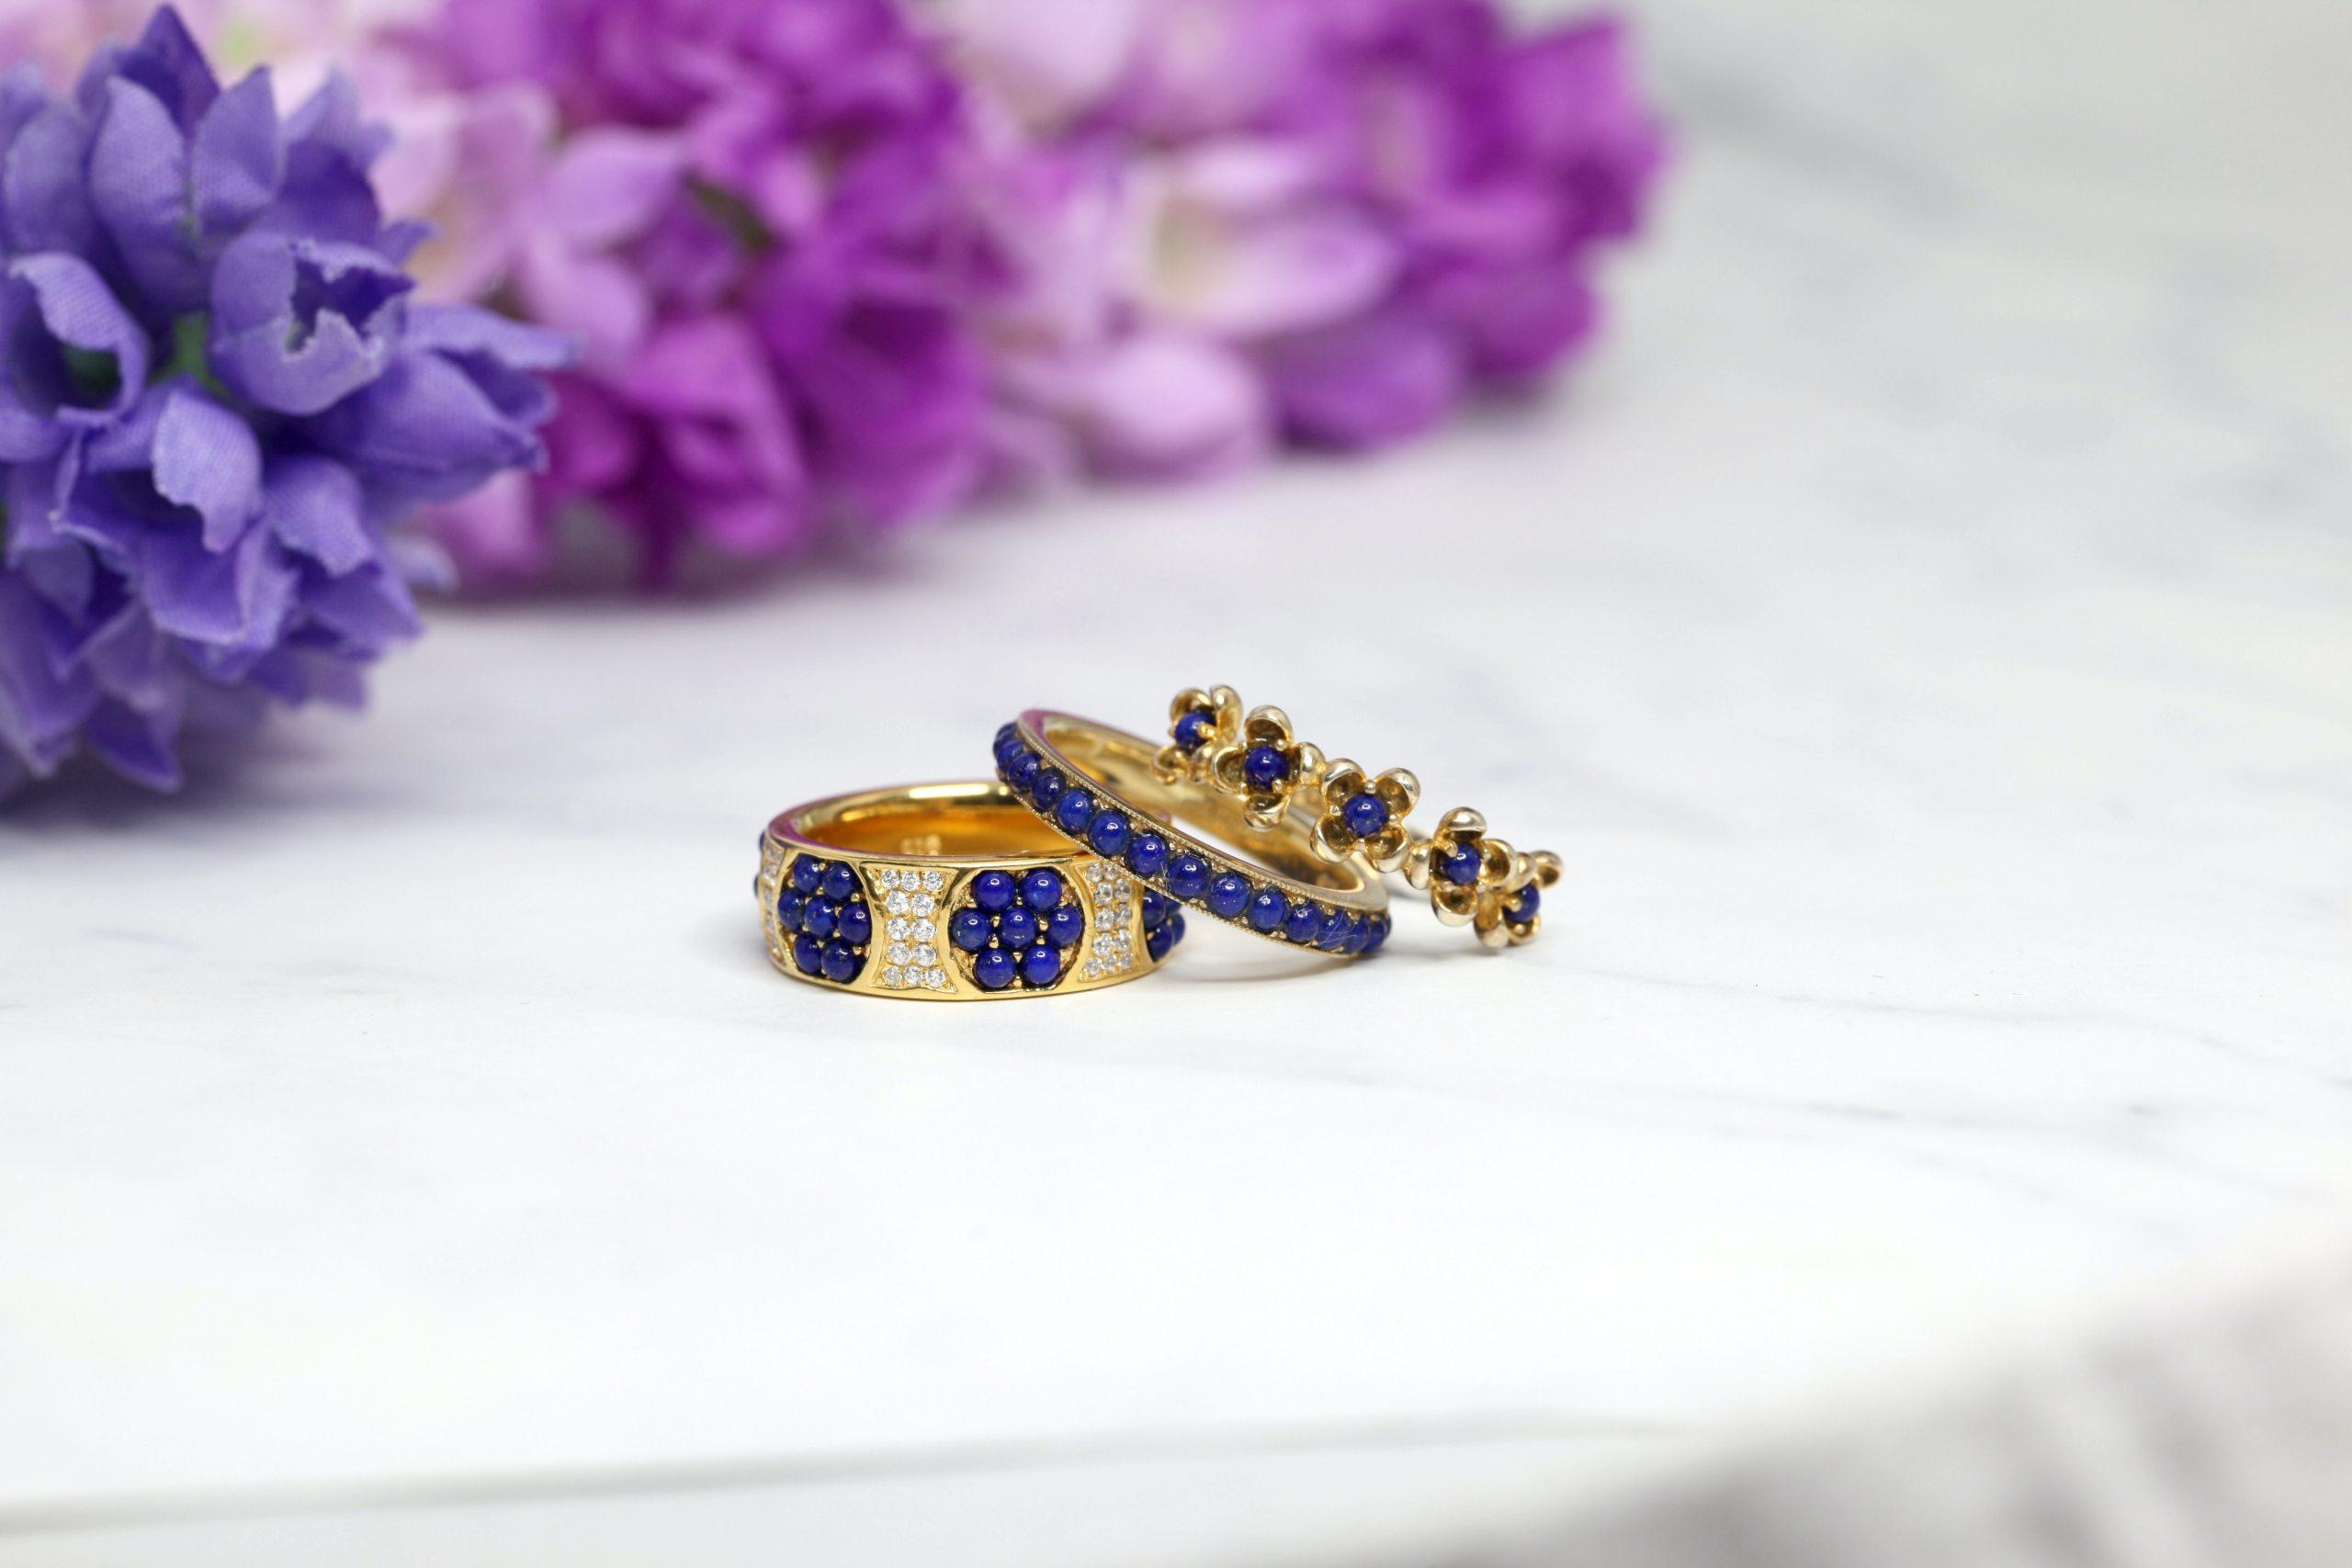 gemstones-crystals-jewelry